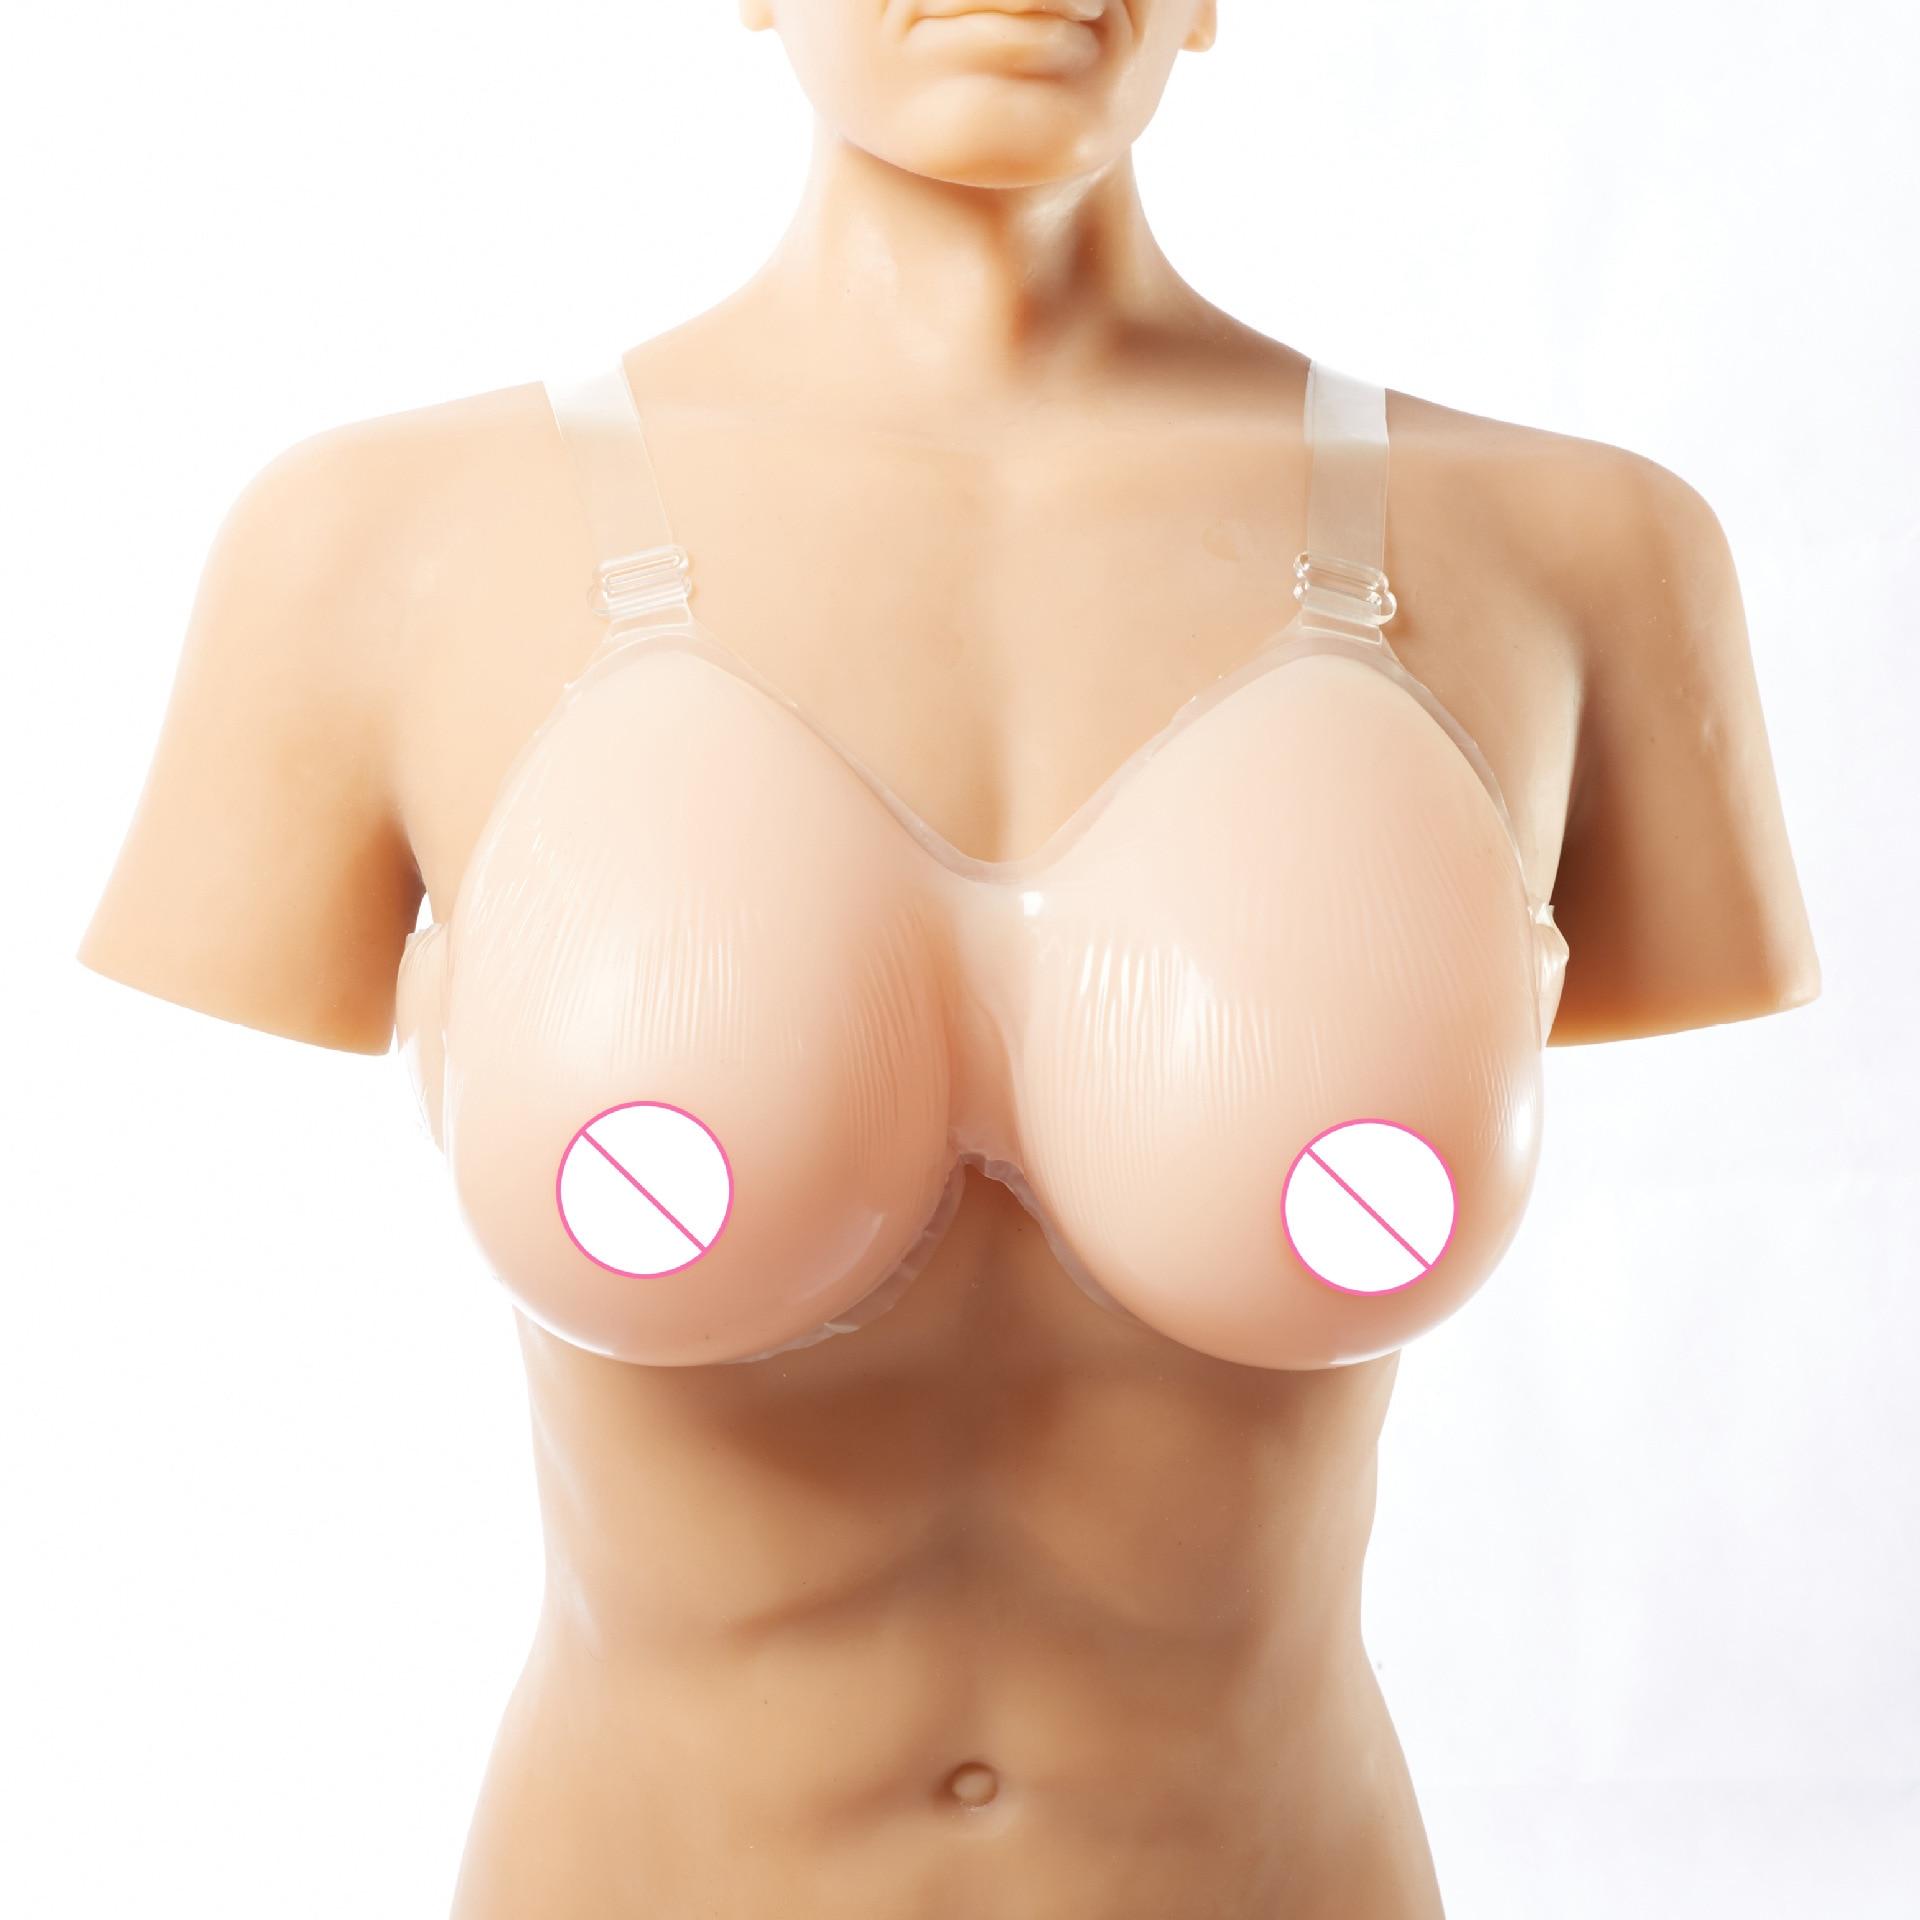 Falsa mama de silicona de grado médico forma tetas falsas pechos artificiales travestis Drag Queen transexual tetas crossdress pecho